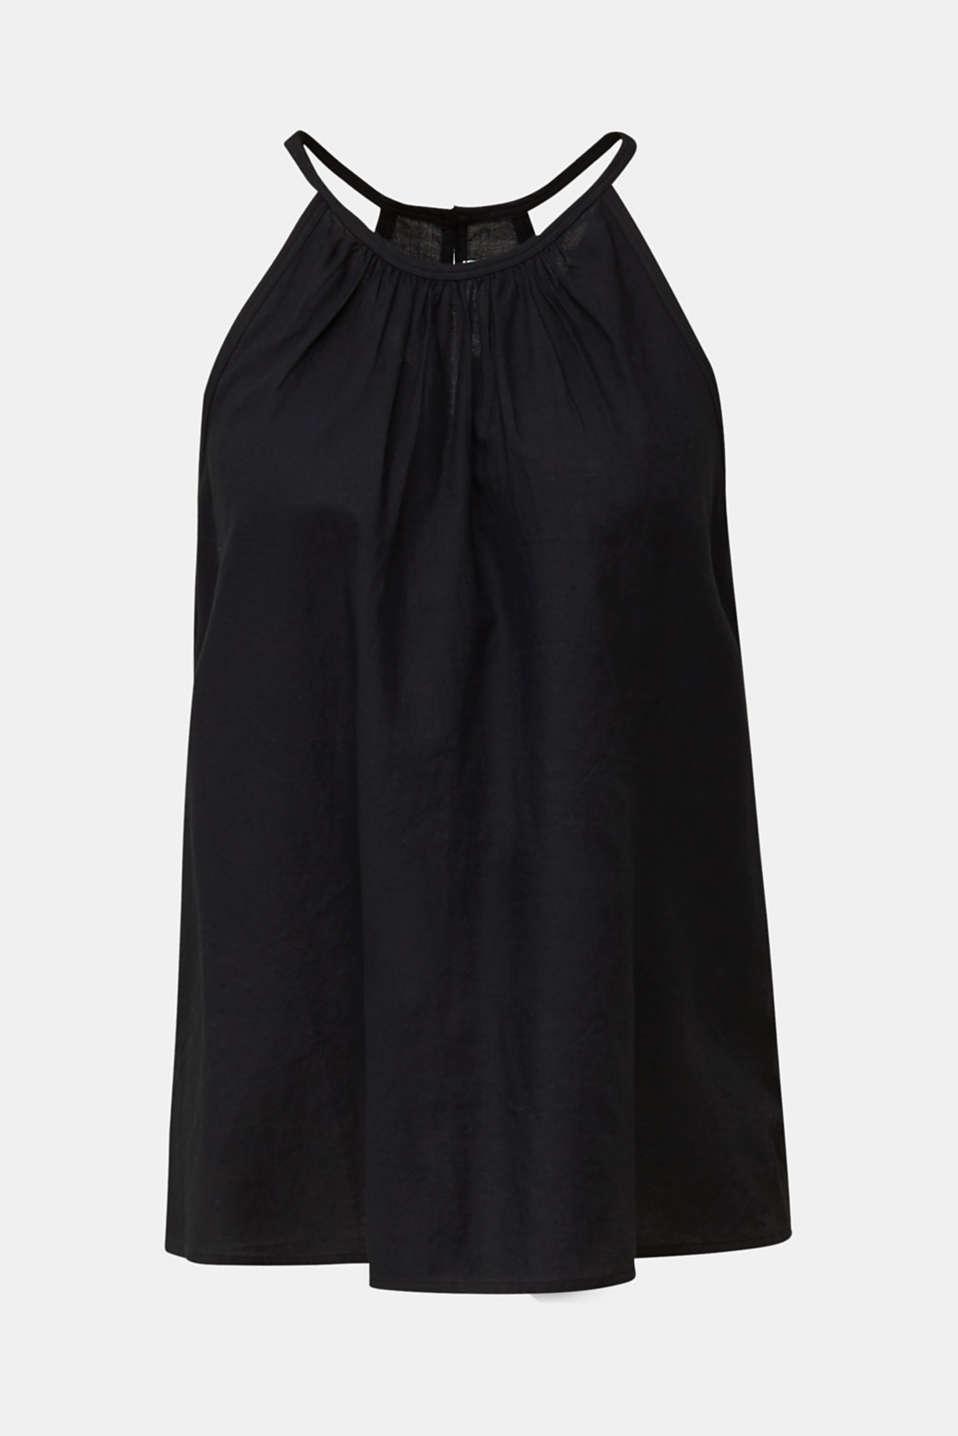 Blouse top, organic cotton, BLACK, detail image number 6